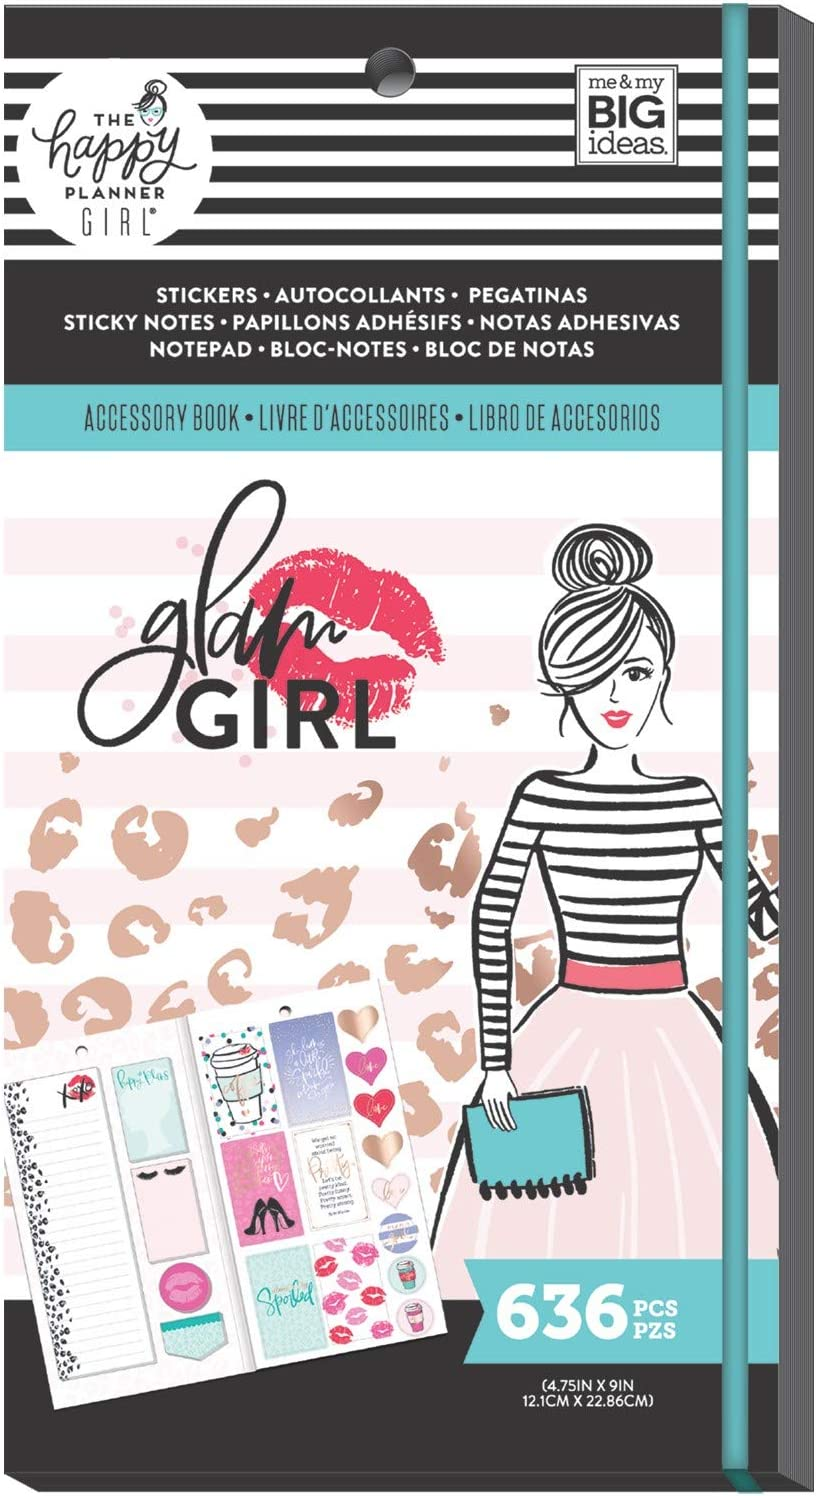 me my BIG shop ideas Accessory Book The Happy Scra Bundle Sacramento Mall Planner -